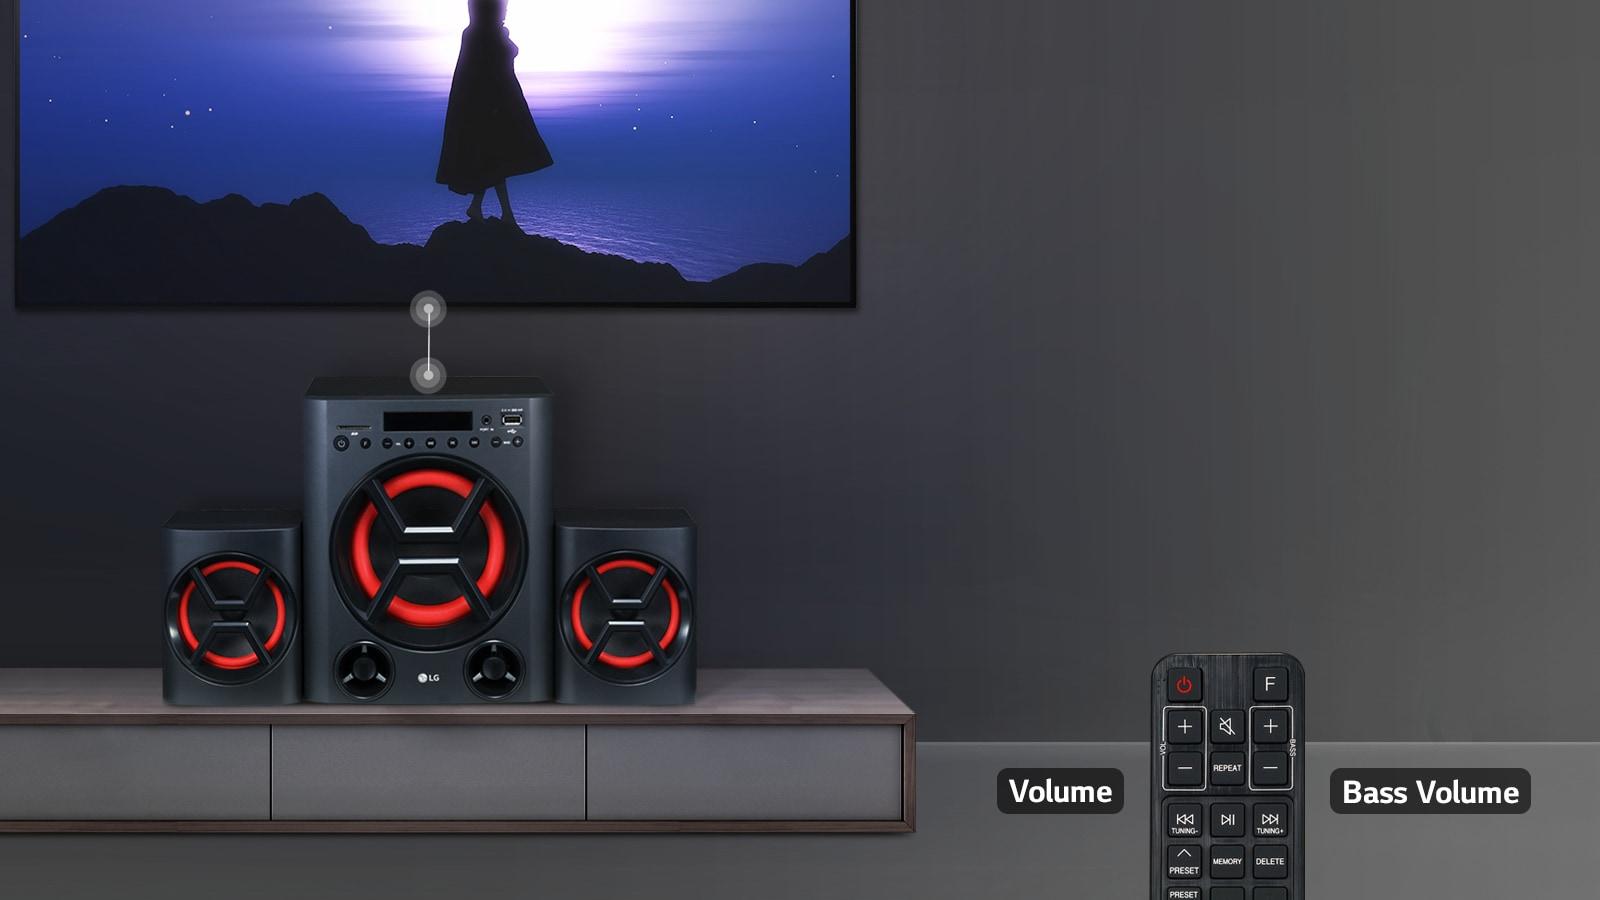 Specially Designed Remote Control<br>1